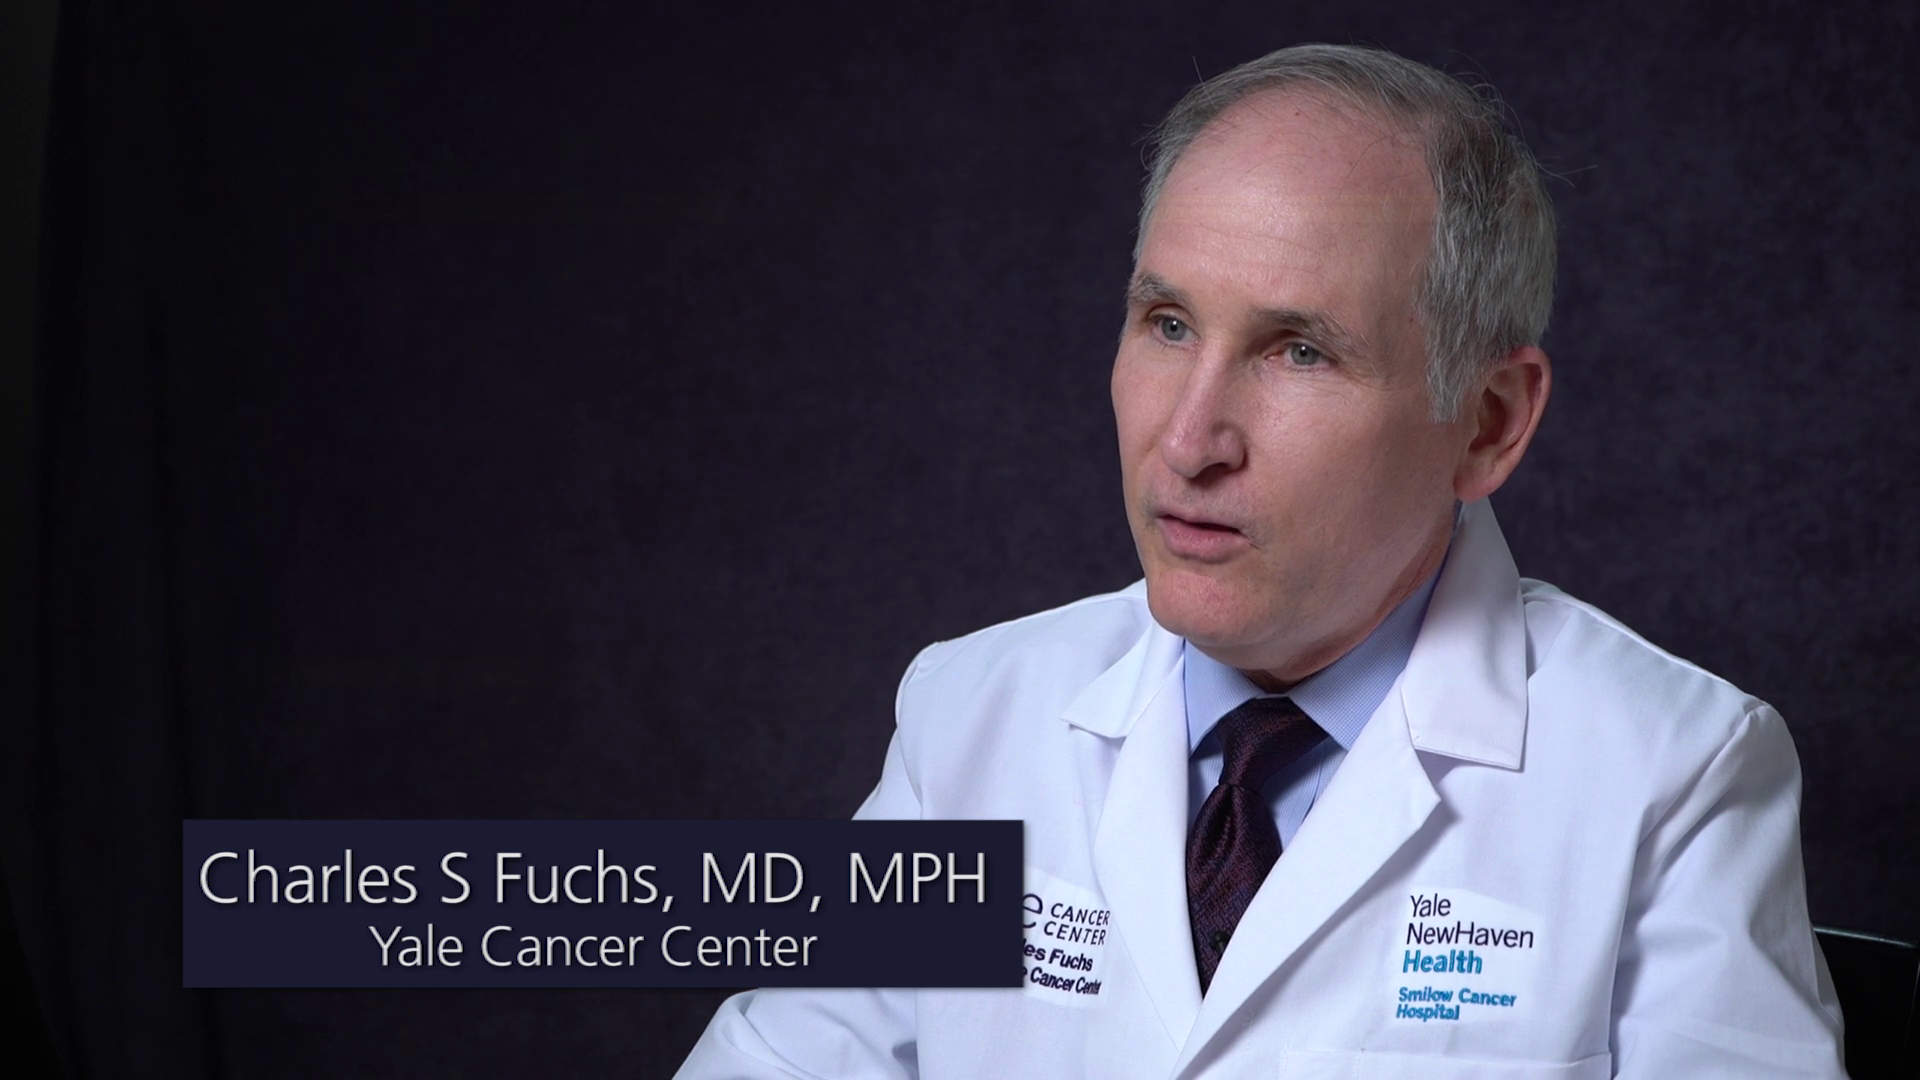 Dr. Charles Fuchs Profile